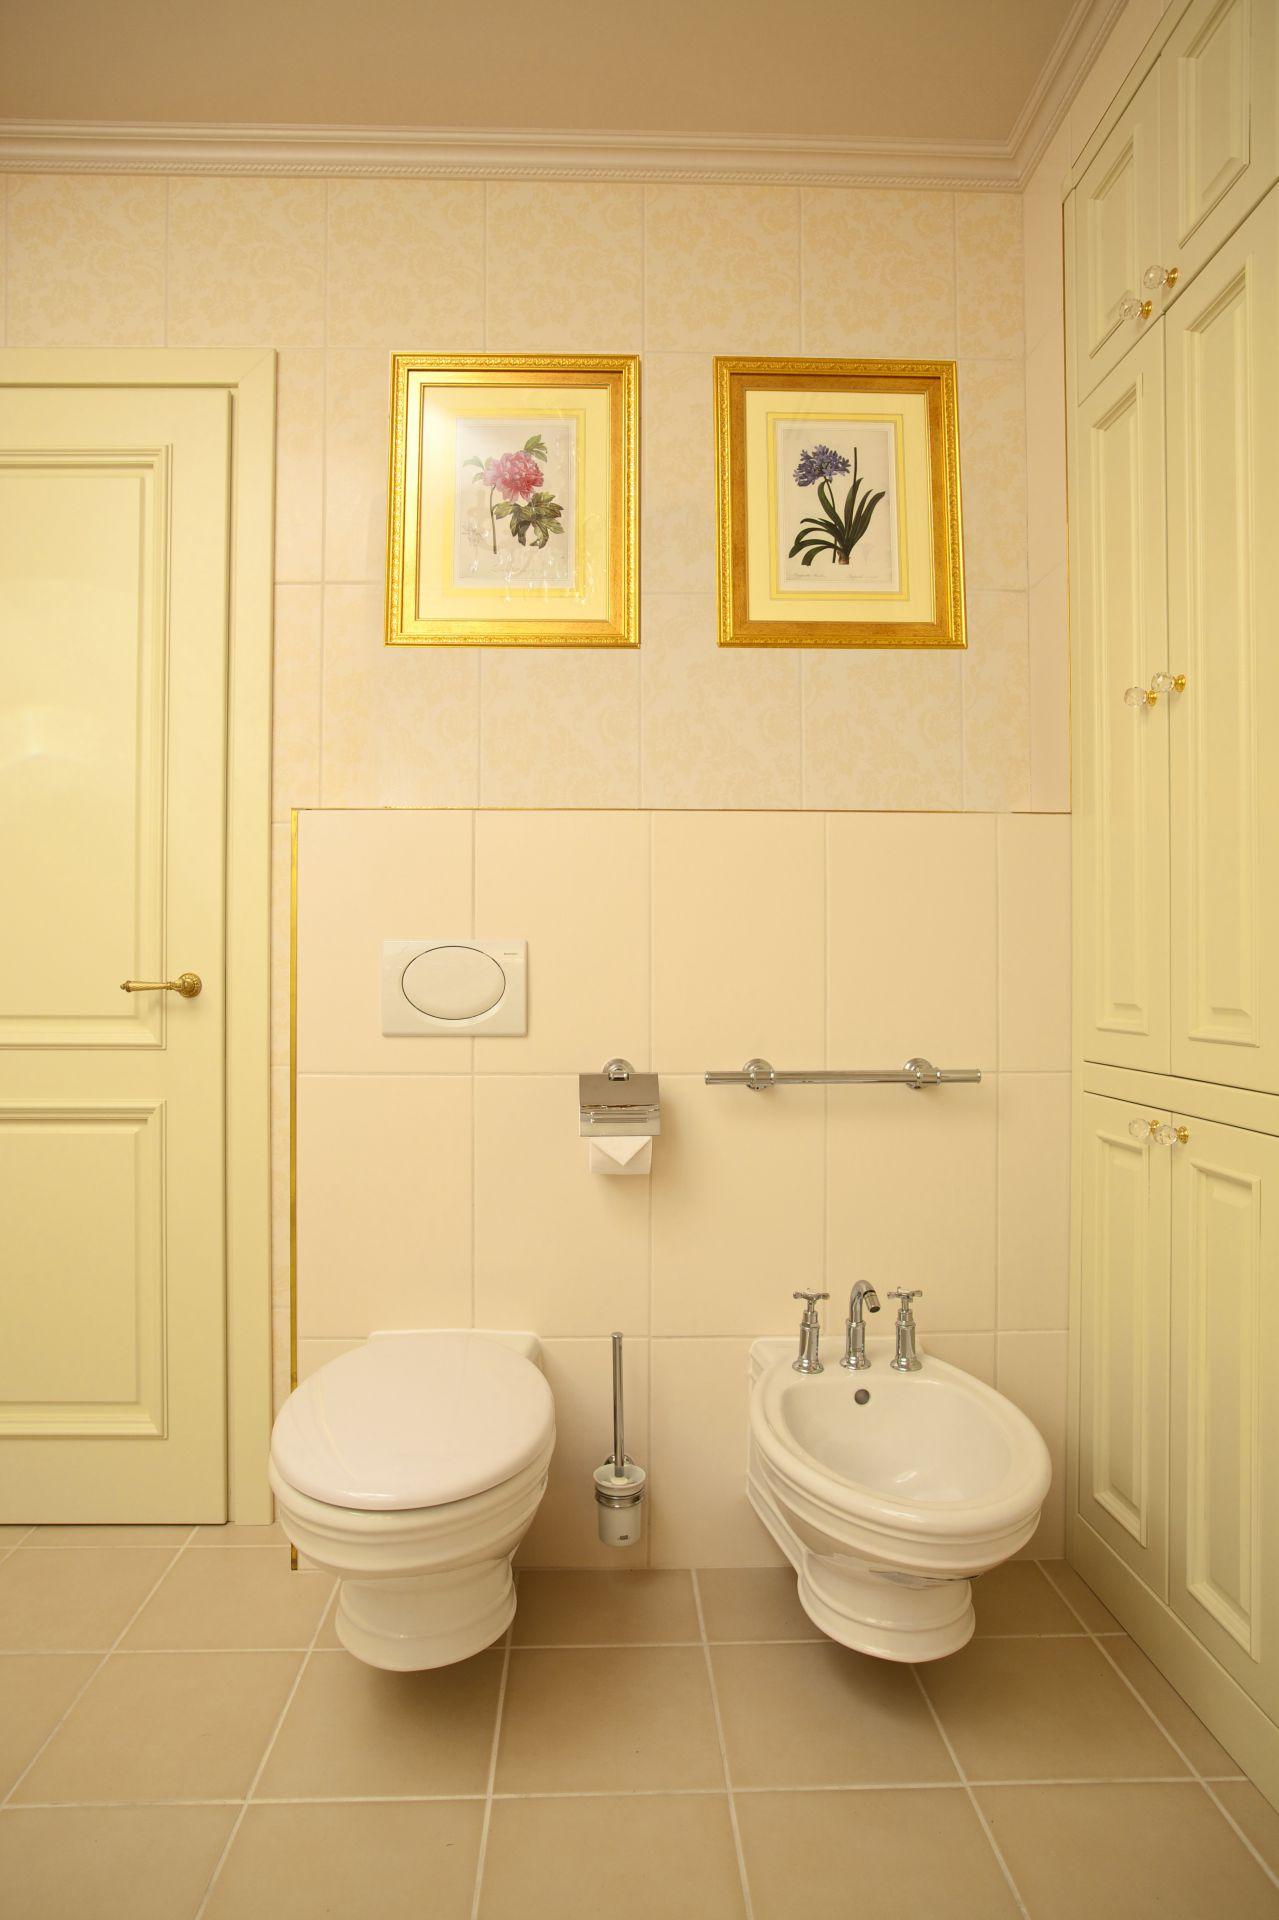 Квартира в классическом стиле INTERIOR-VT-CLASSIC-IMG_pokaz01